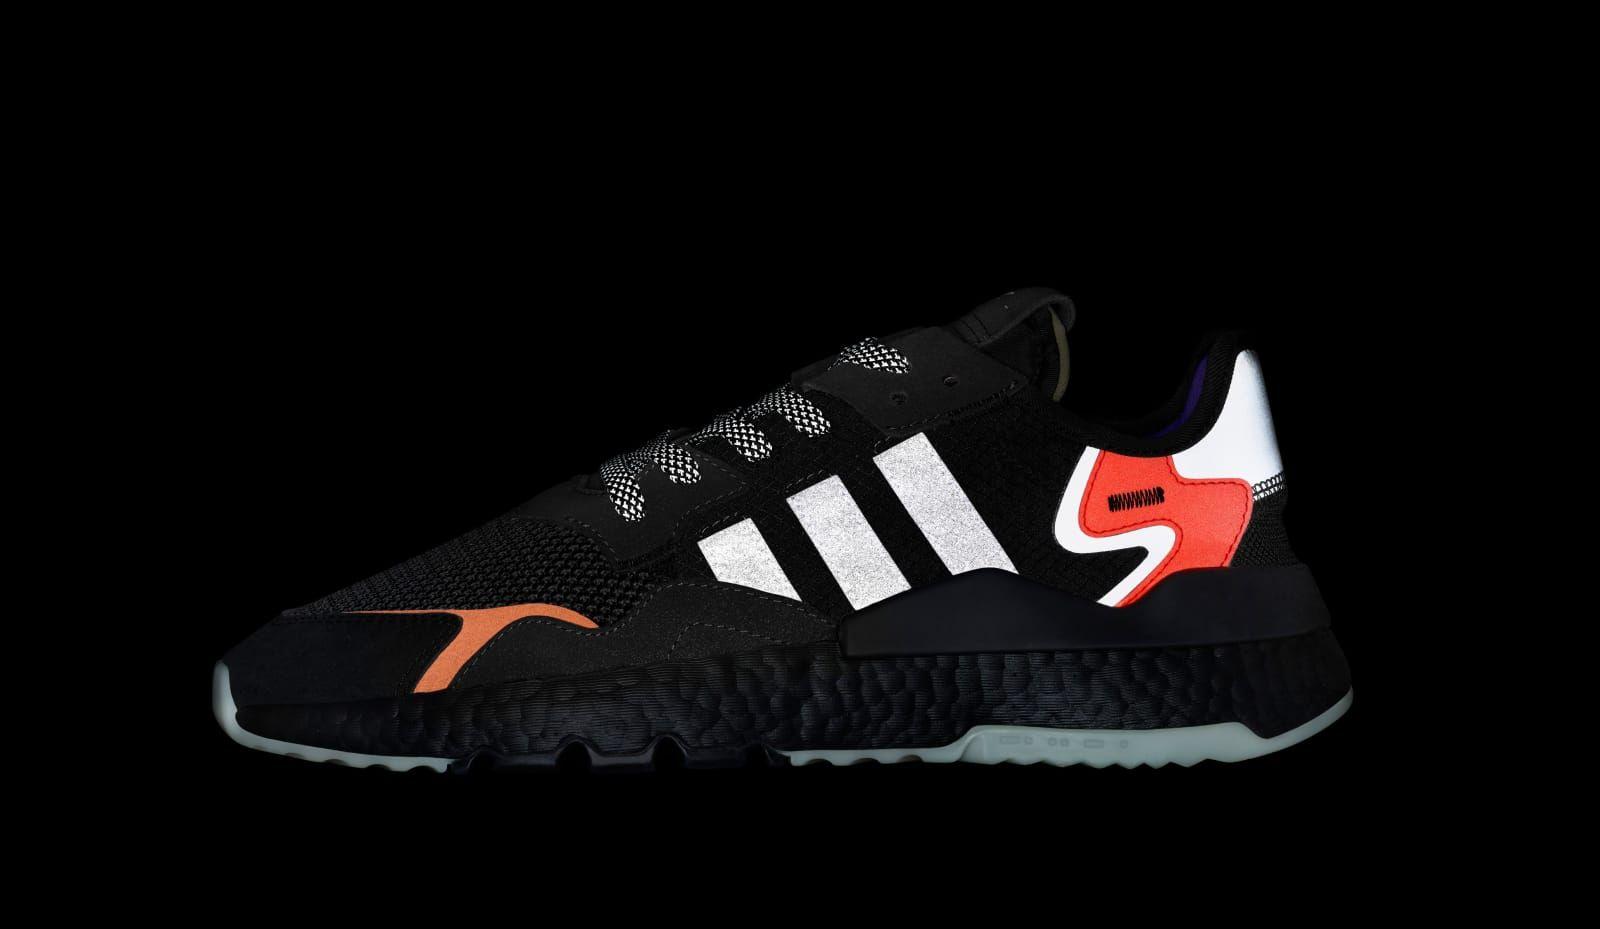 a029b0c994519c Adidas Nite Jogger 2019 CG7088 Release Date